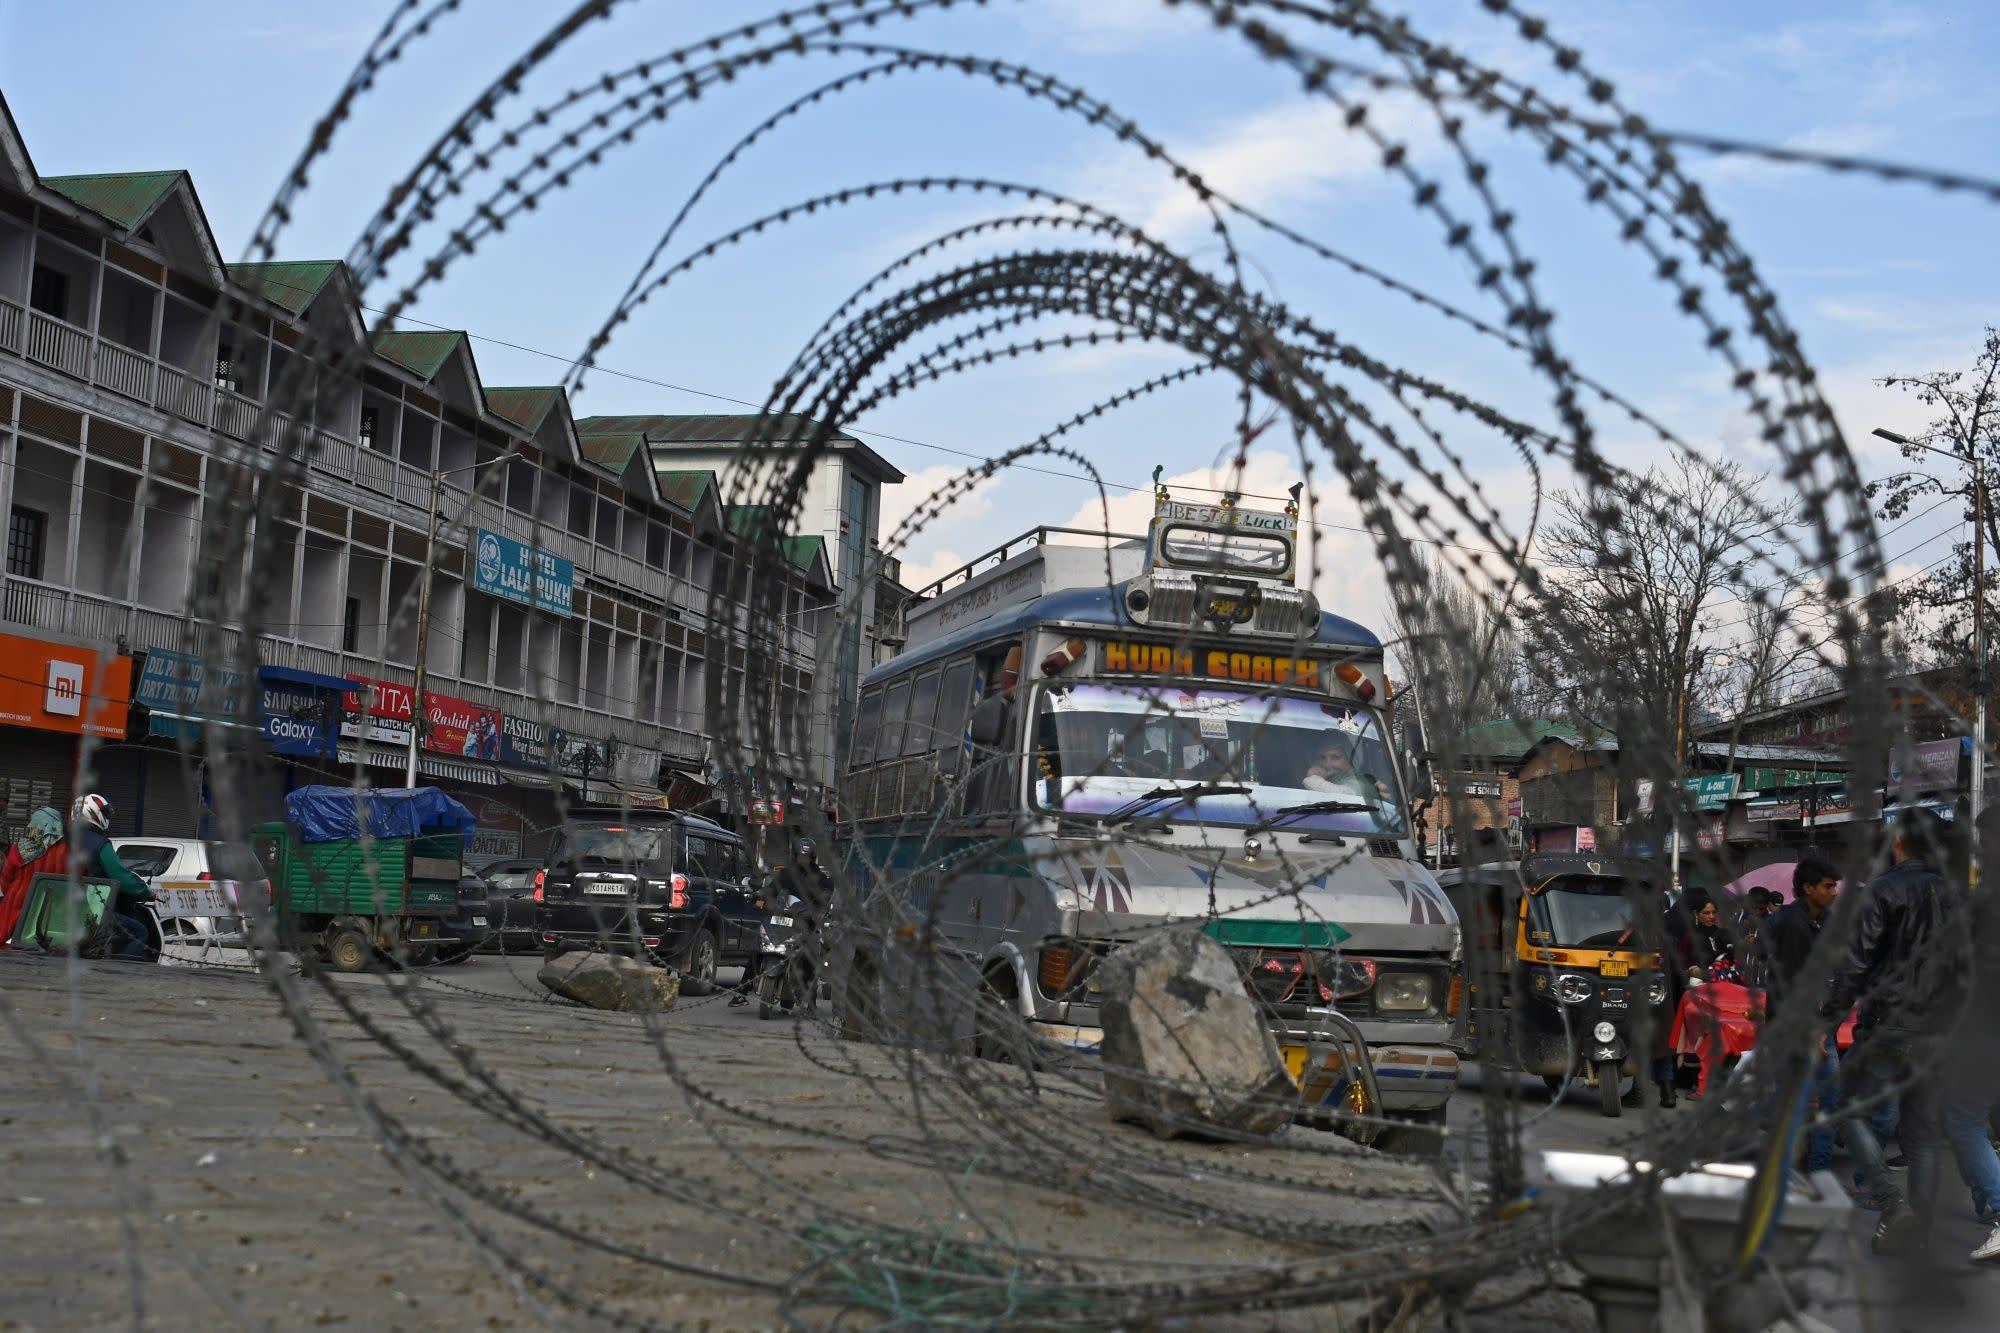 Modi Ally Calls for Boycott of China Companies on Kashmir, Trade 53c2fafa3dc93b433f15ecb992c801fc